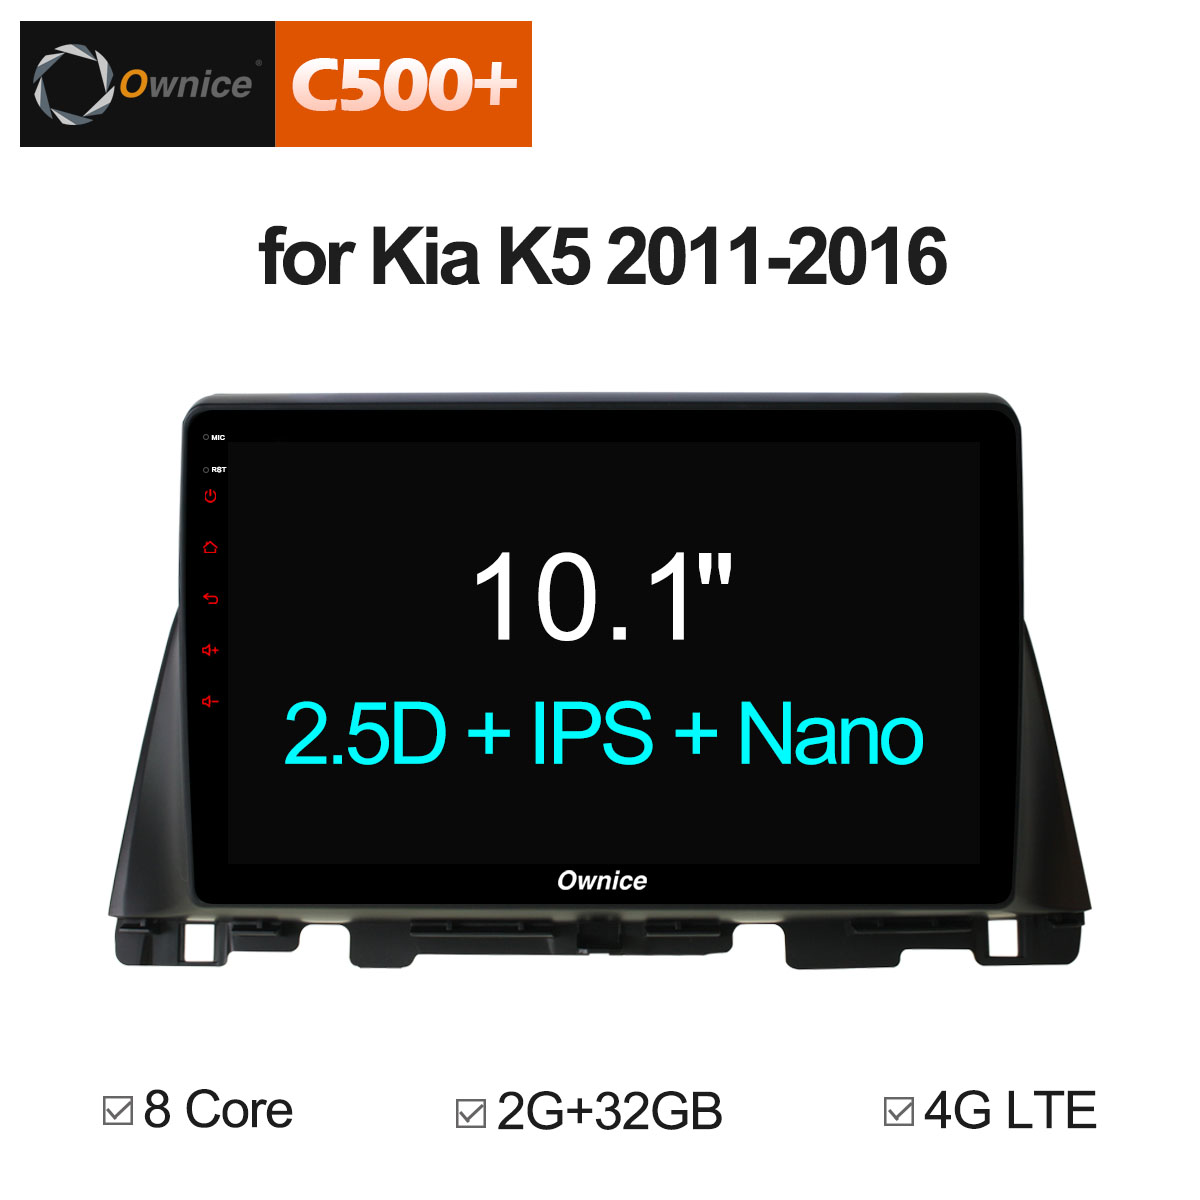 Ownice C500+ G10 10.1 2GB RAM Octa Core Android 8.1 Car DVD Stereo Radio GPS Player For KIA K5 OPTIMA 2011 - 2016 2017 4G SIM ownice c500 4g sim lte octa 8 core android 6 0 for kia ceed 2013 2015 car dvd player gps navi radio wifi 4g bt 2gb ram 32g rom